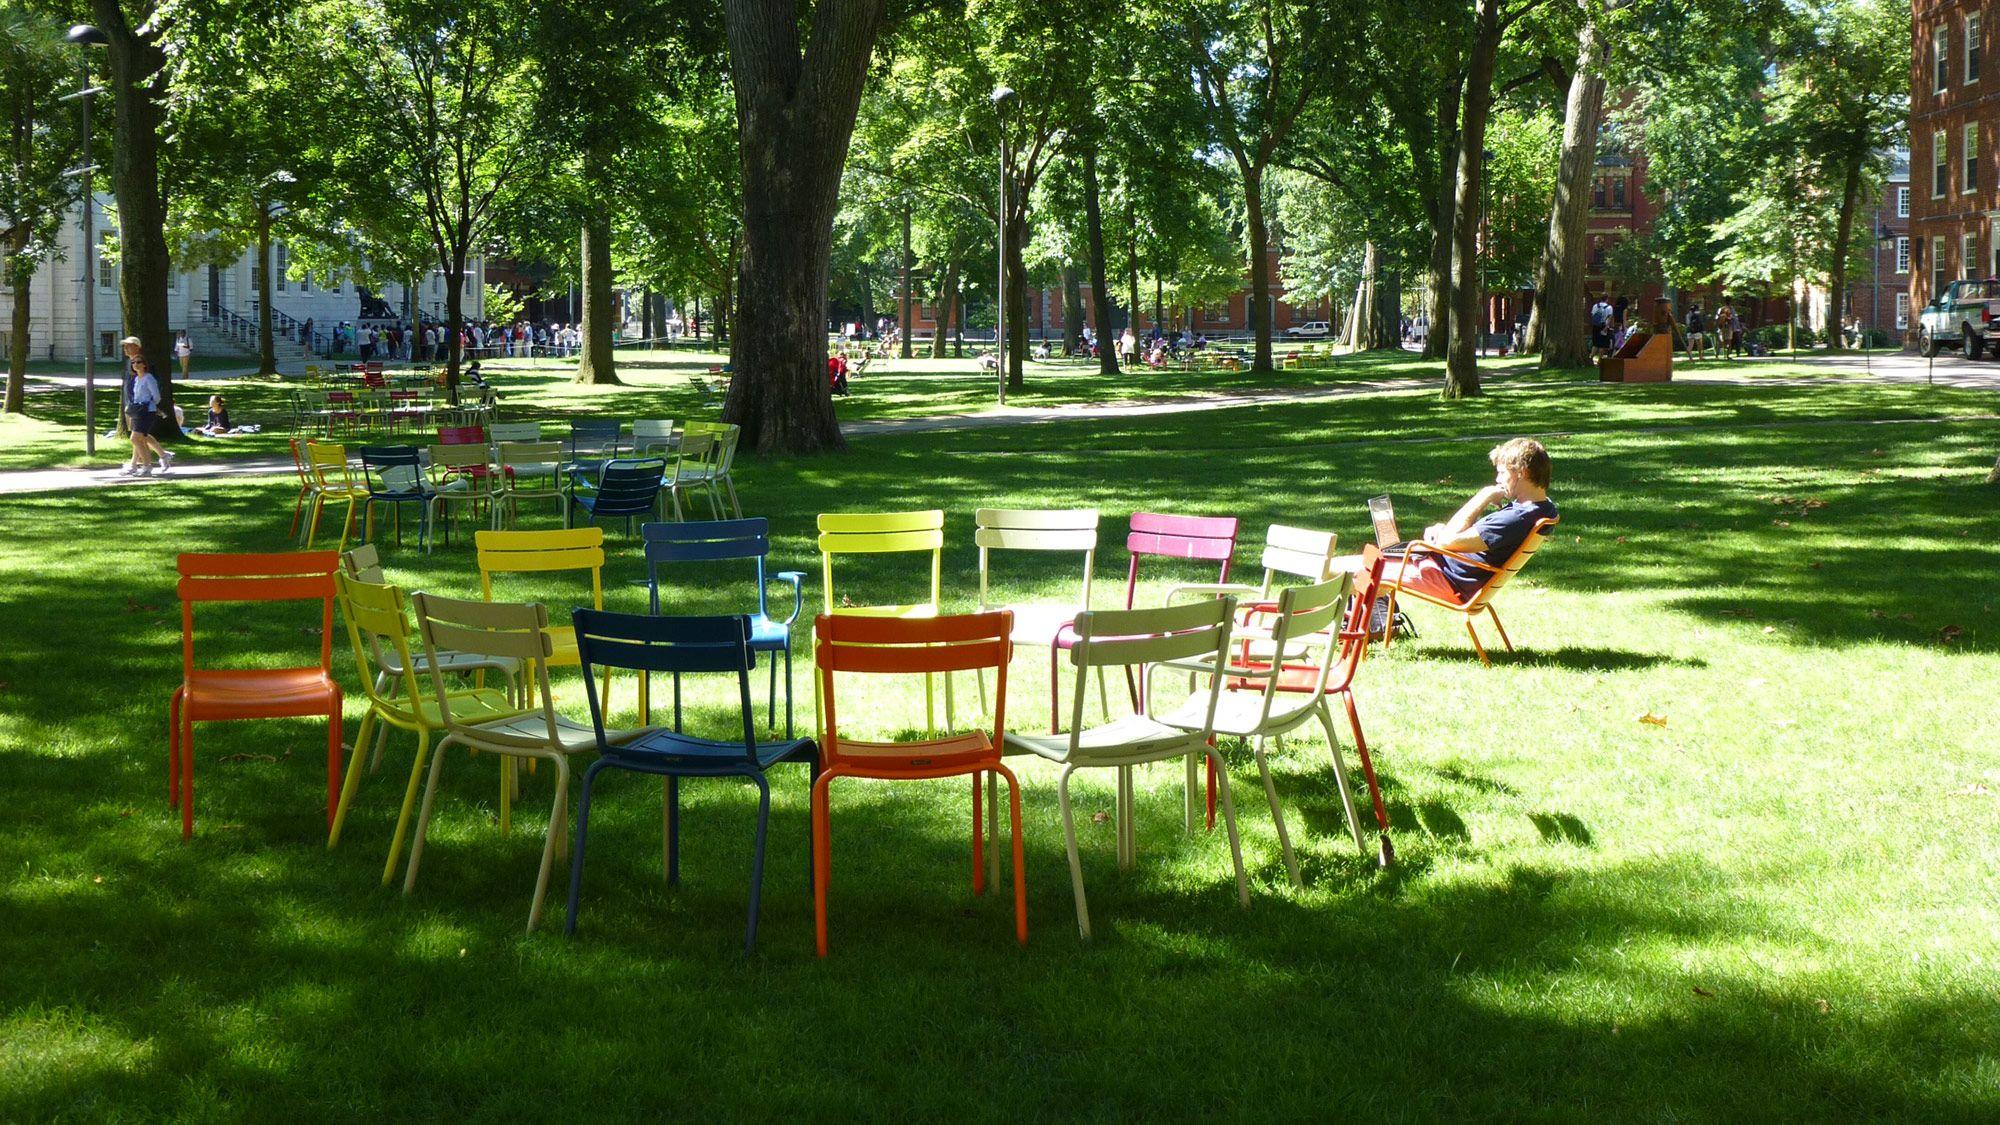 universit harvard campus cambridge usa mobilier luxembourg fermob fermob dans le. Black Bedroom Furniture Sets. Home Design Ideas